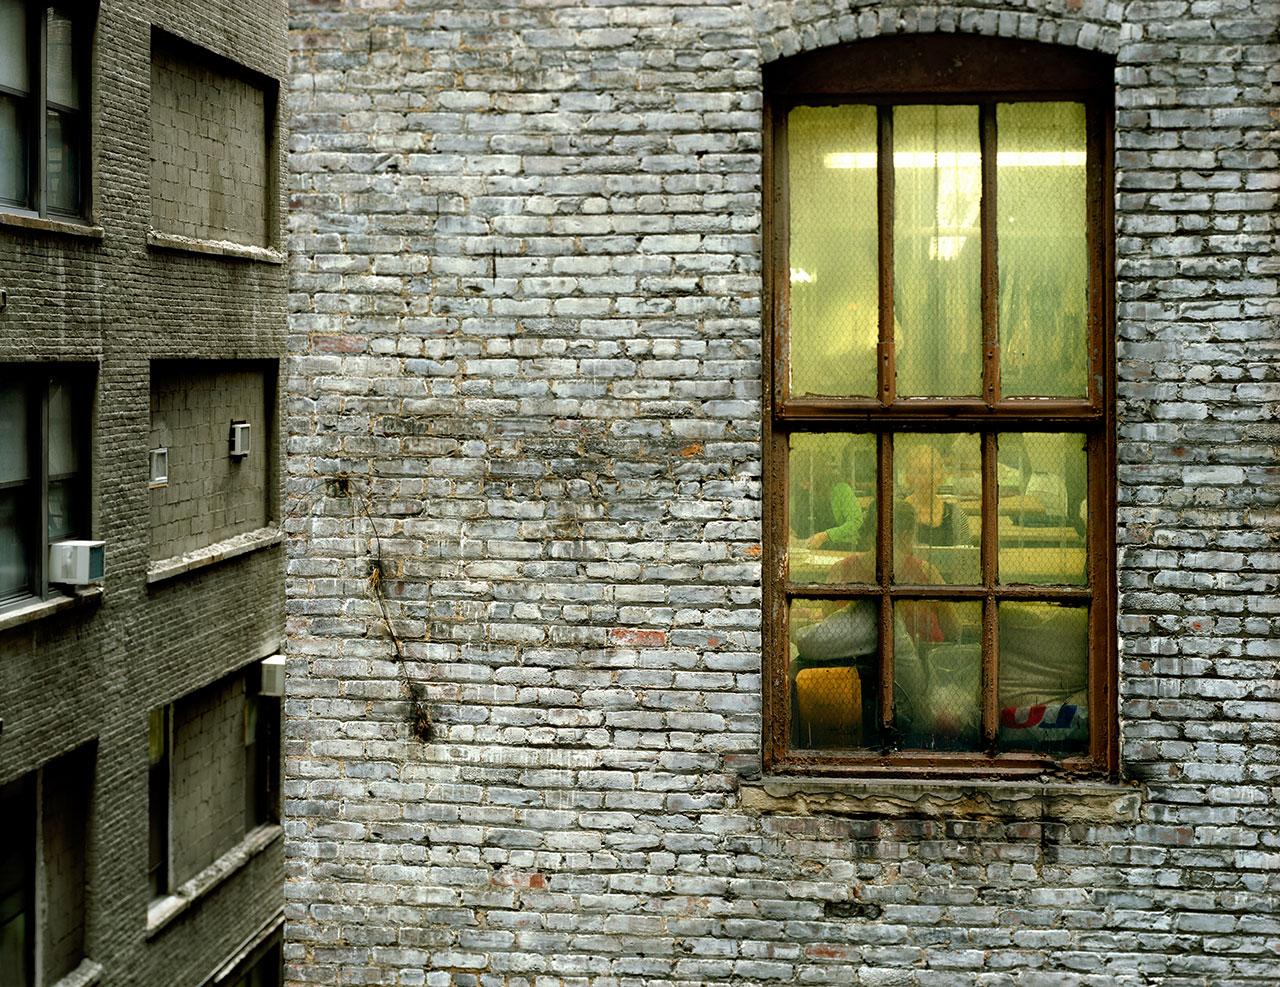 Seen neighbor through the window